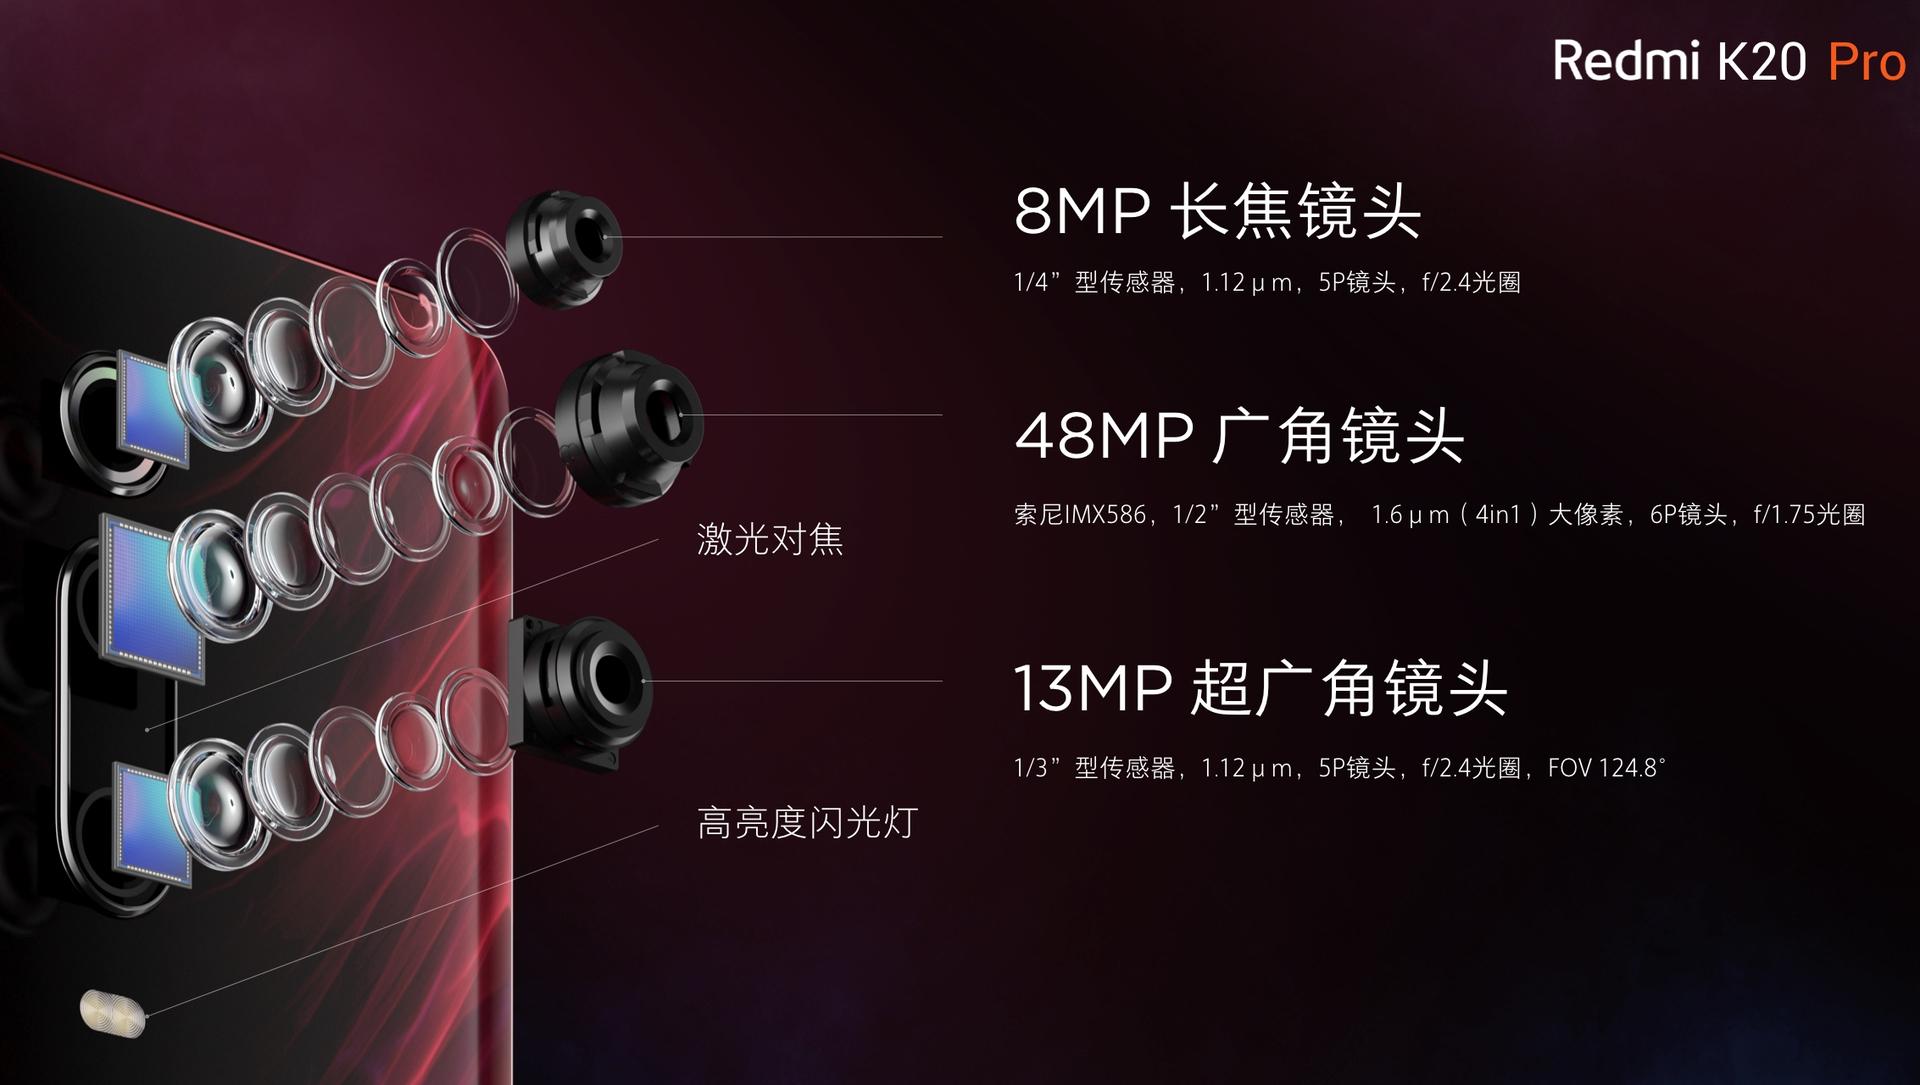 The Redmi K20 Pro cameras.